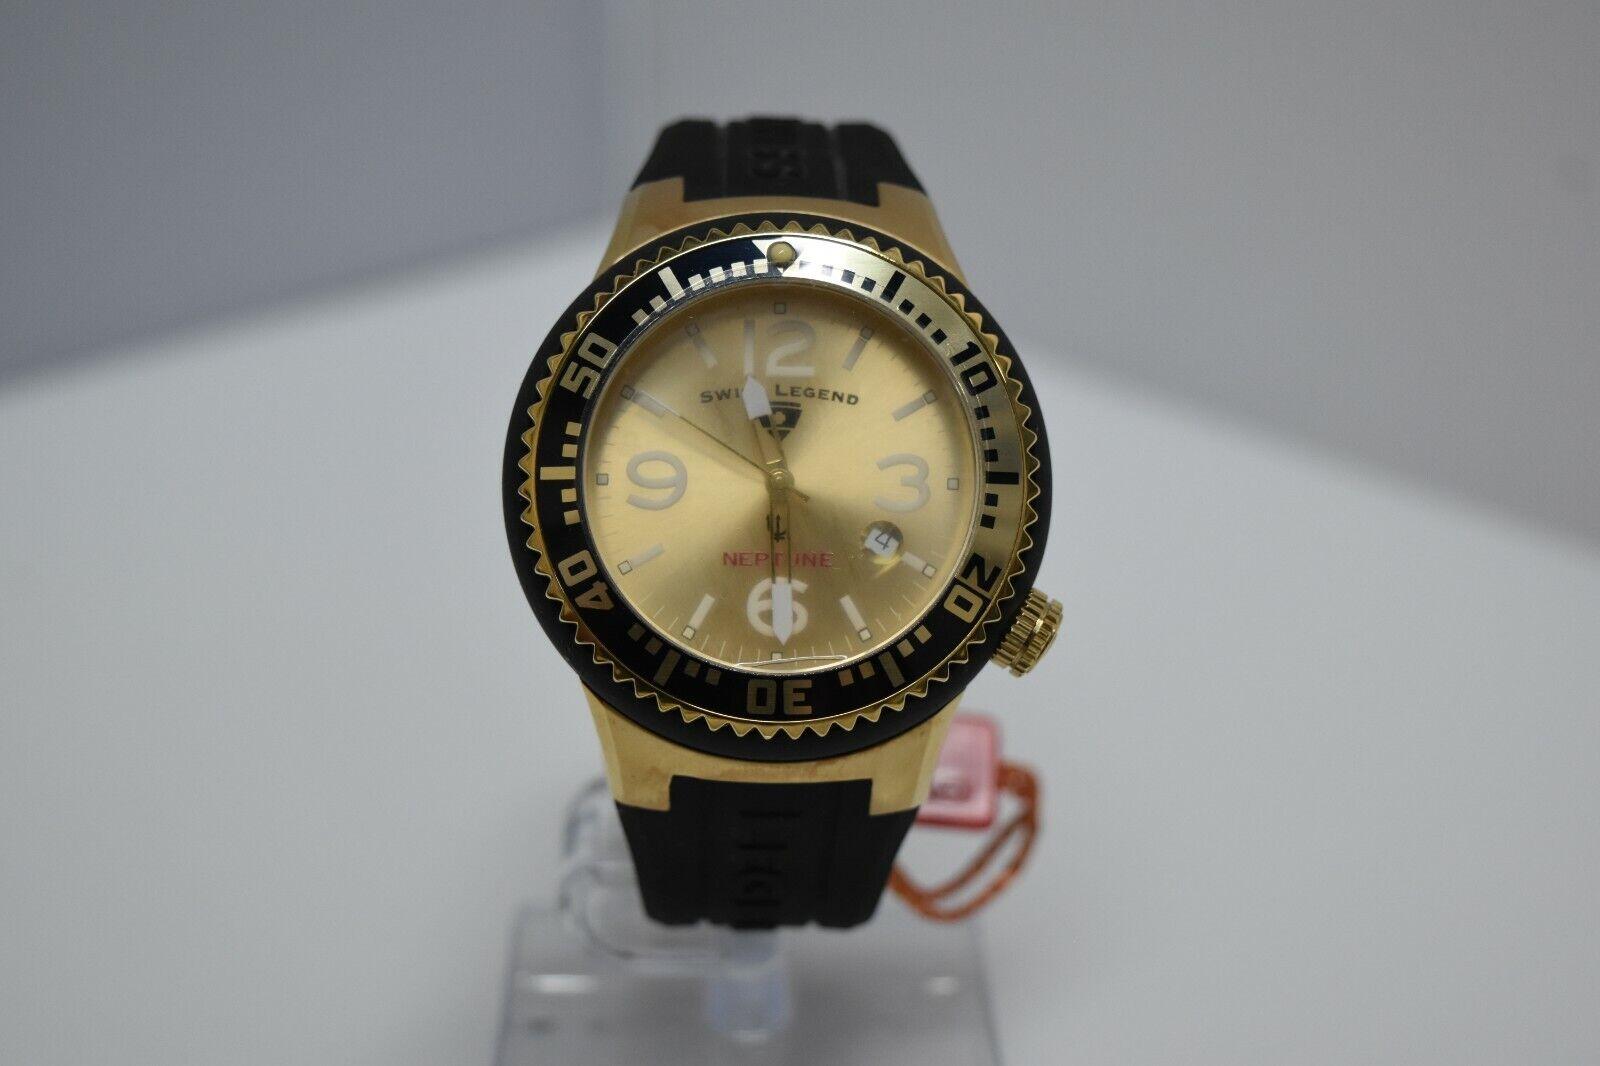 Swiss Legend Swiss Sapphitek 48mm SL-21848P Watch Black/YG/Gold